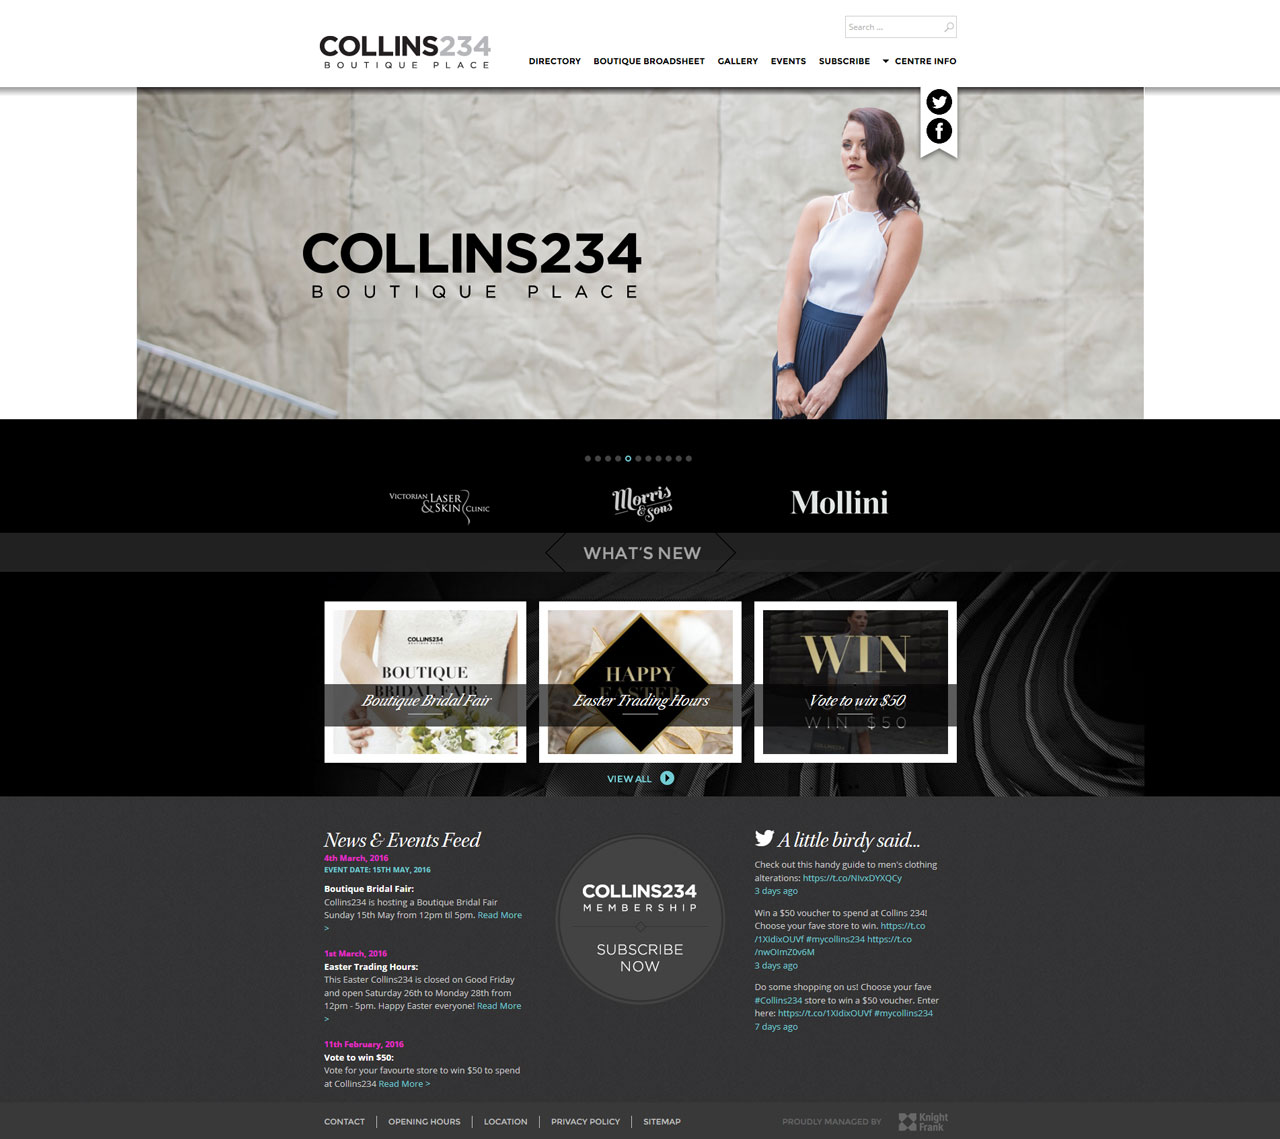 collins234_1